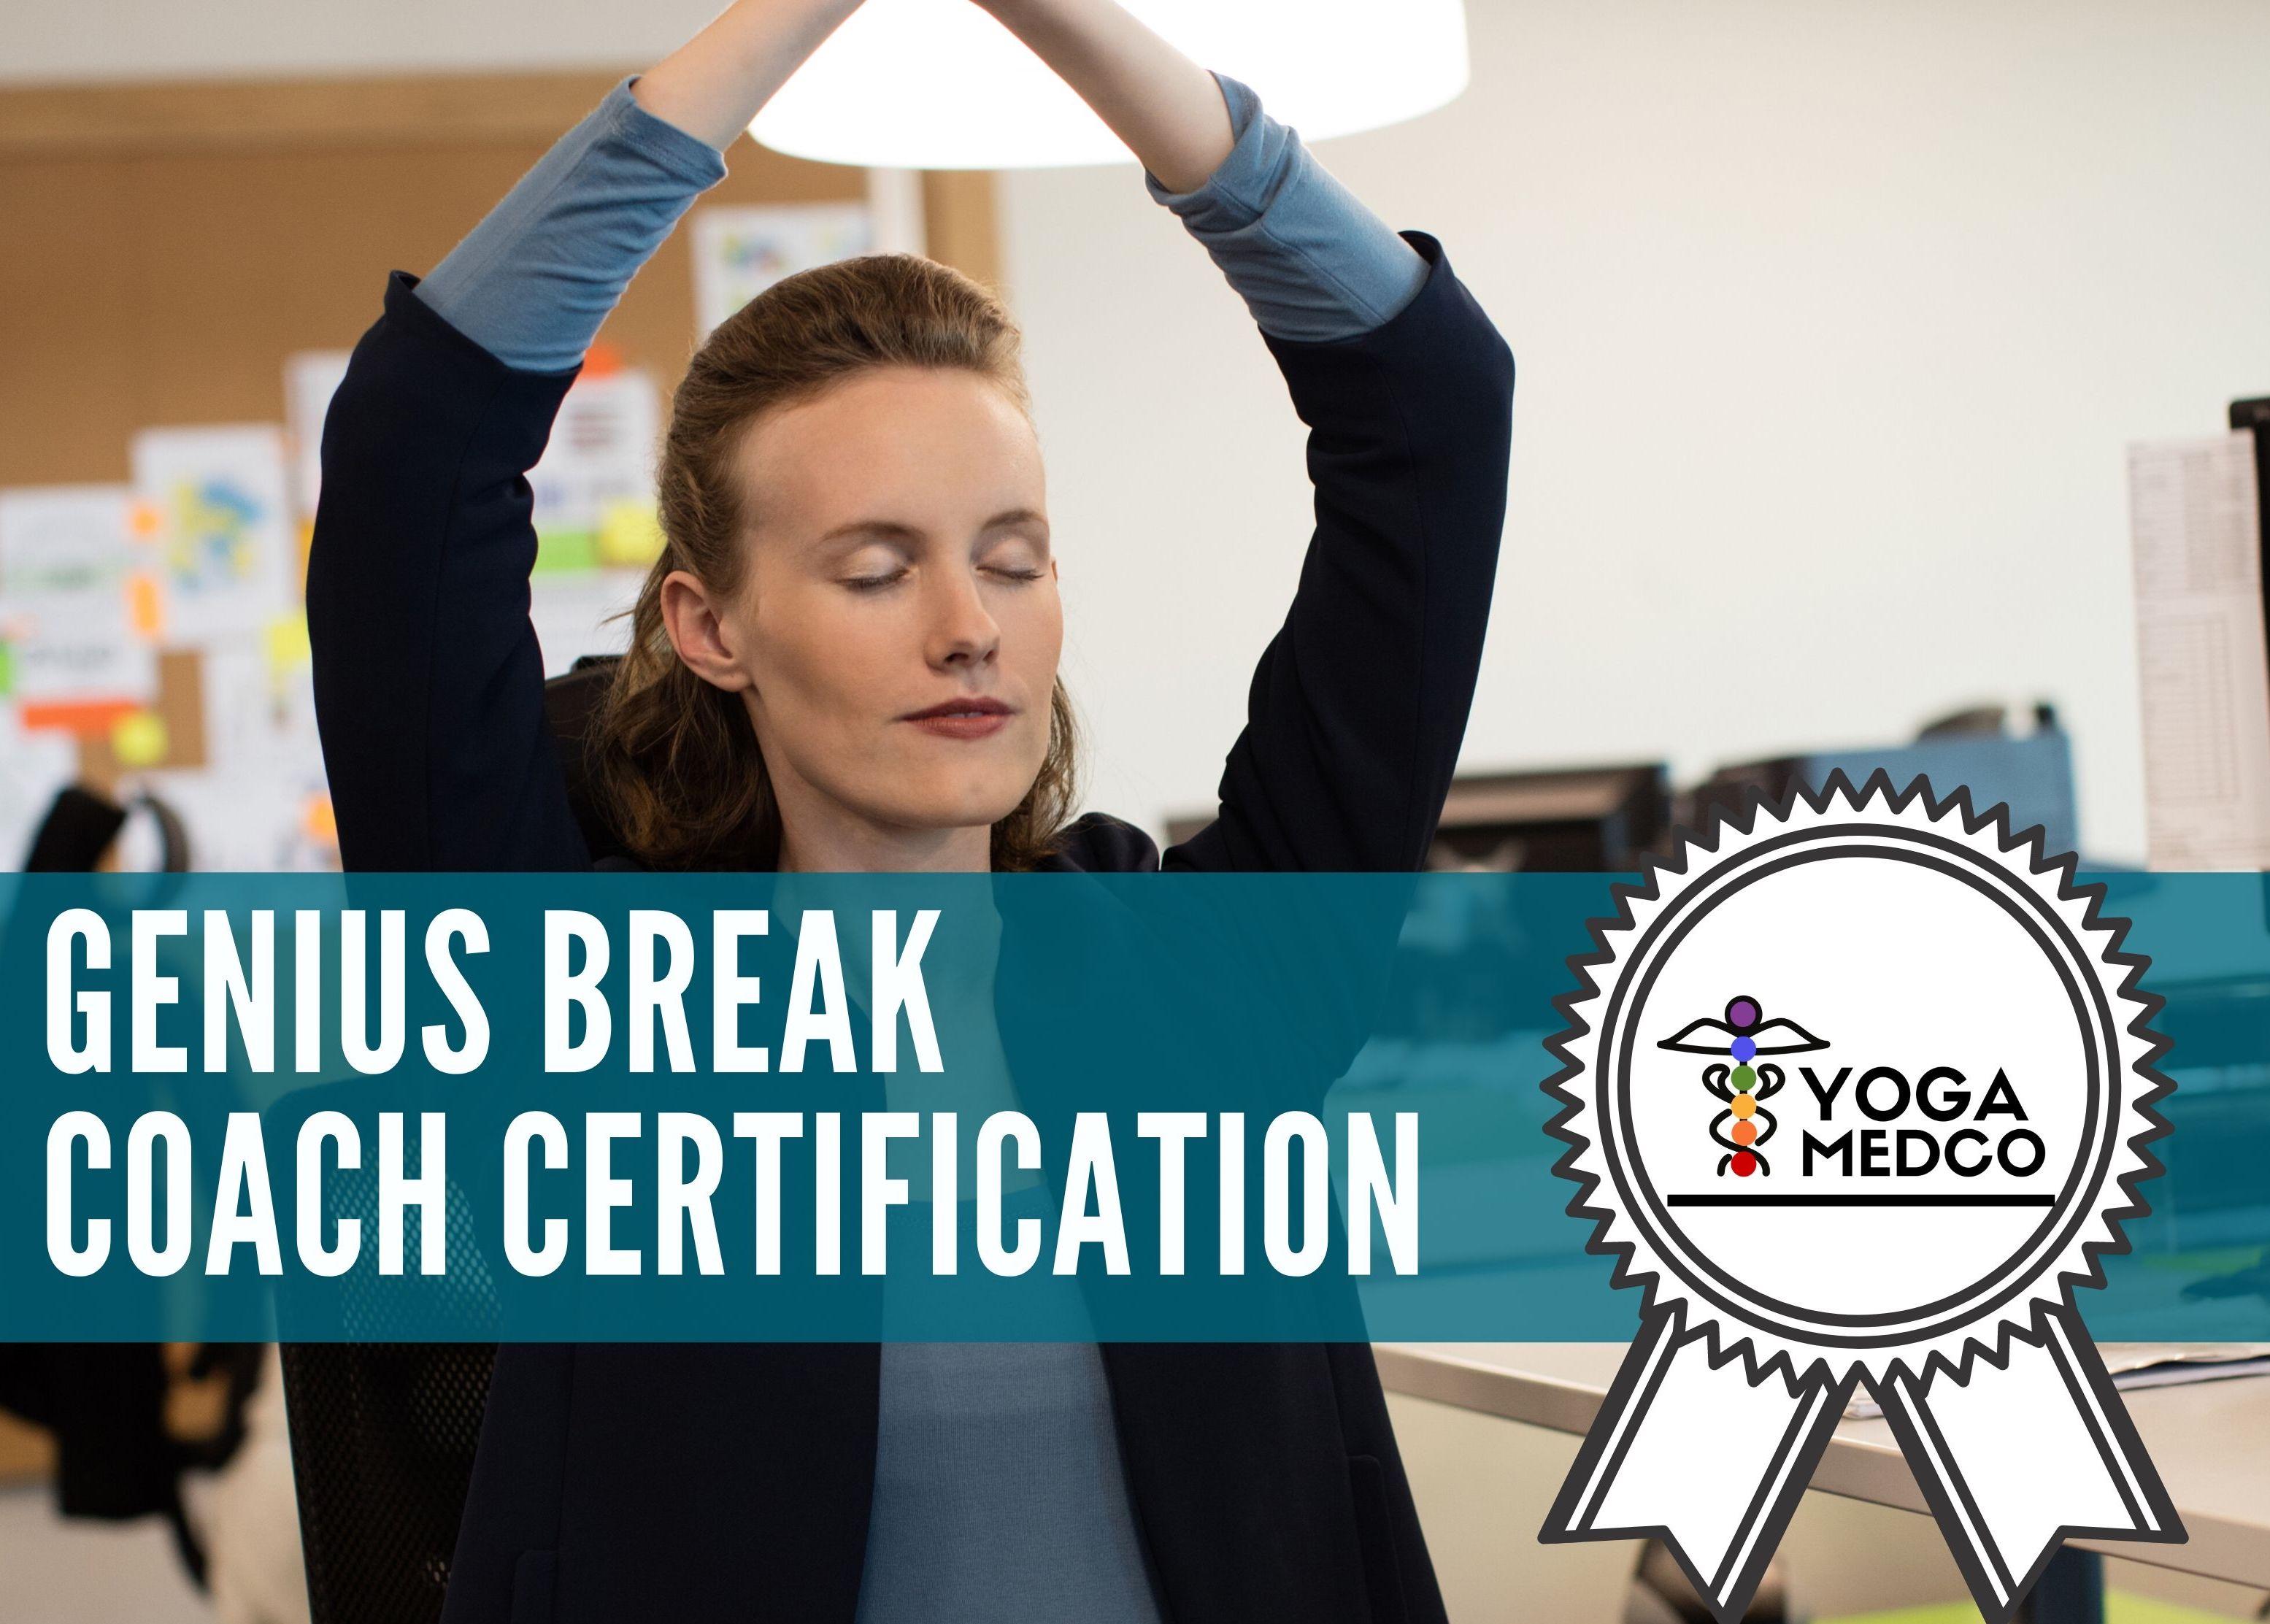 Genius Break Coach Certification DCAC